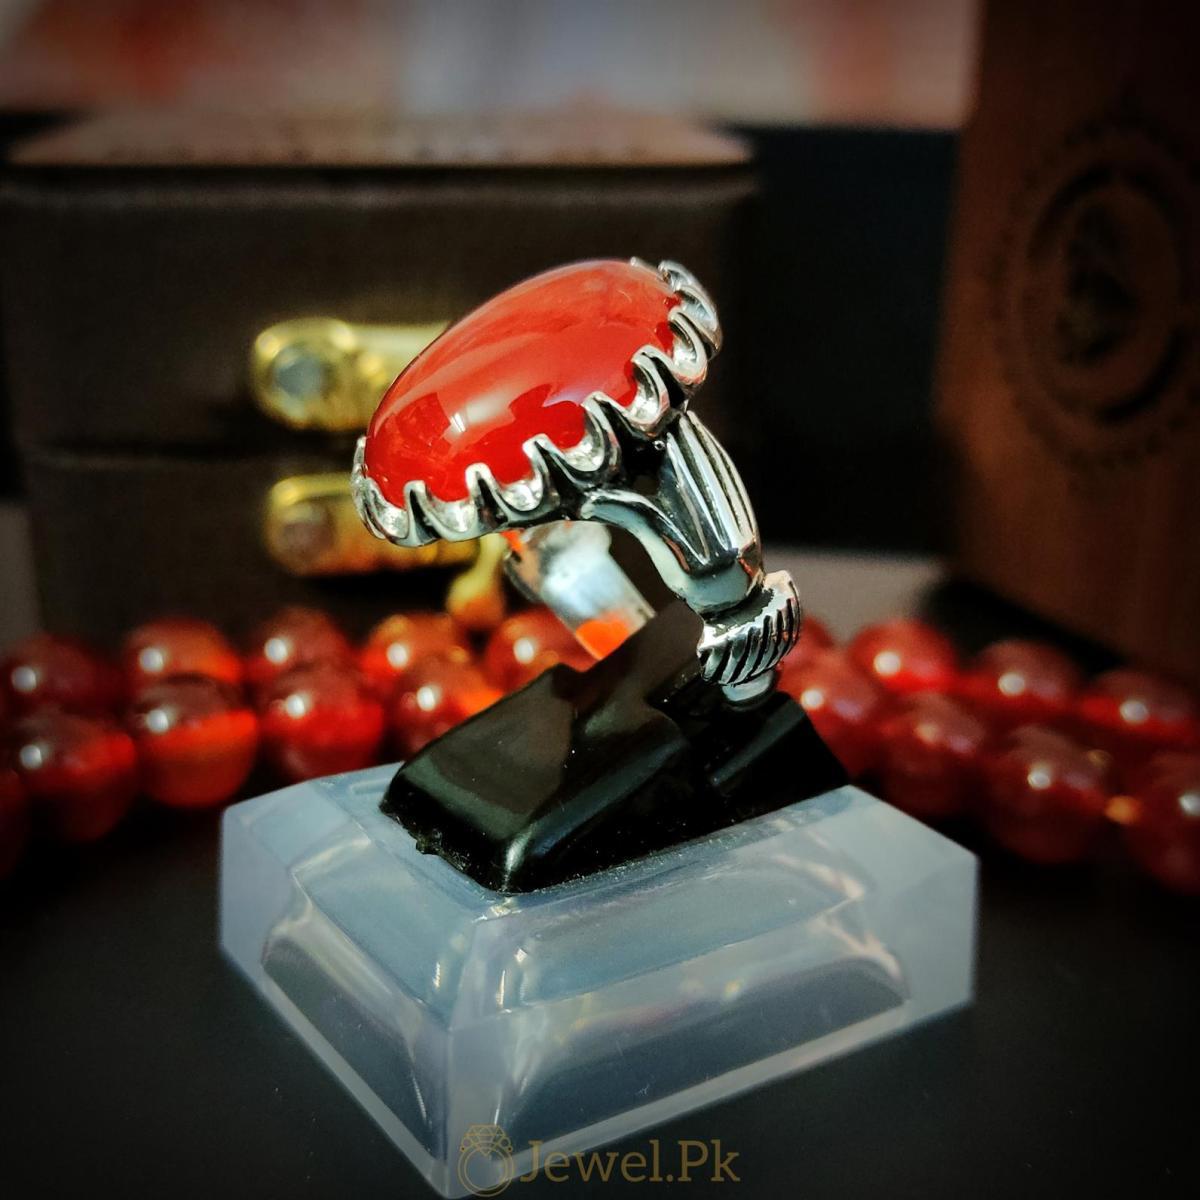 Beautiful Red Aqeeq Ring Yemeni Aqeeq Agate ring buy online 925 Silver Handmade Ring 6 natural gemstones pakistan + 925 silver jewelry online